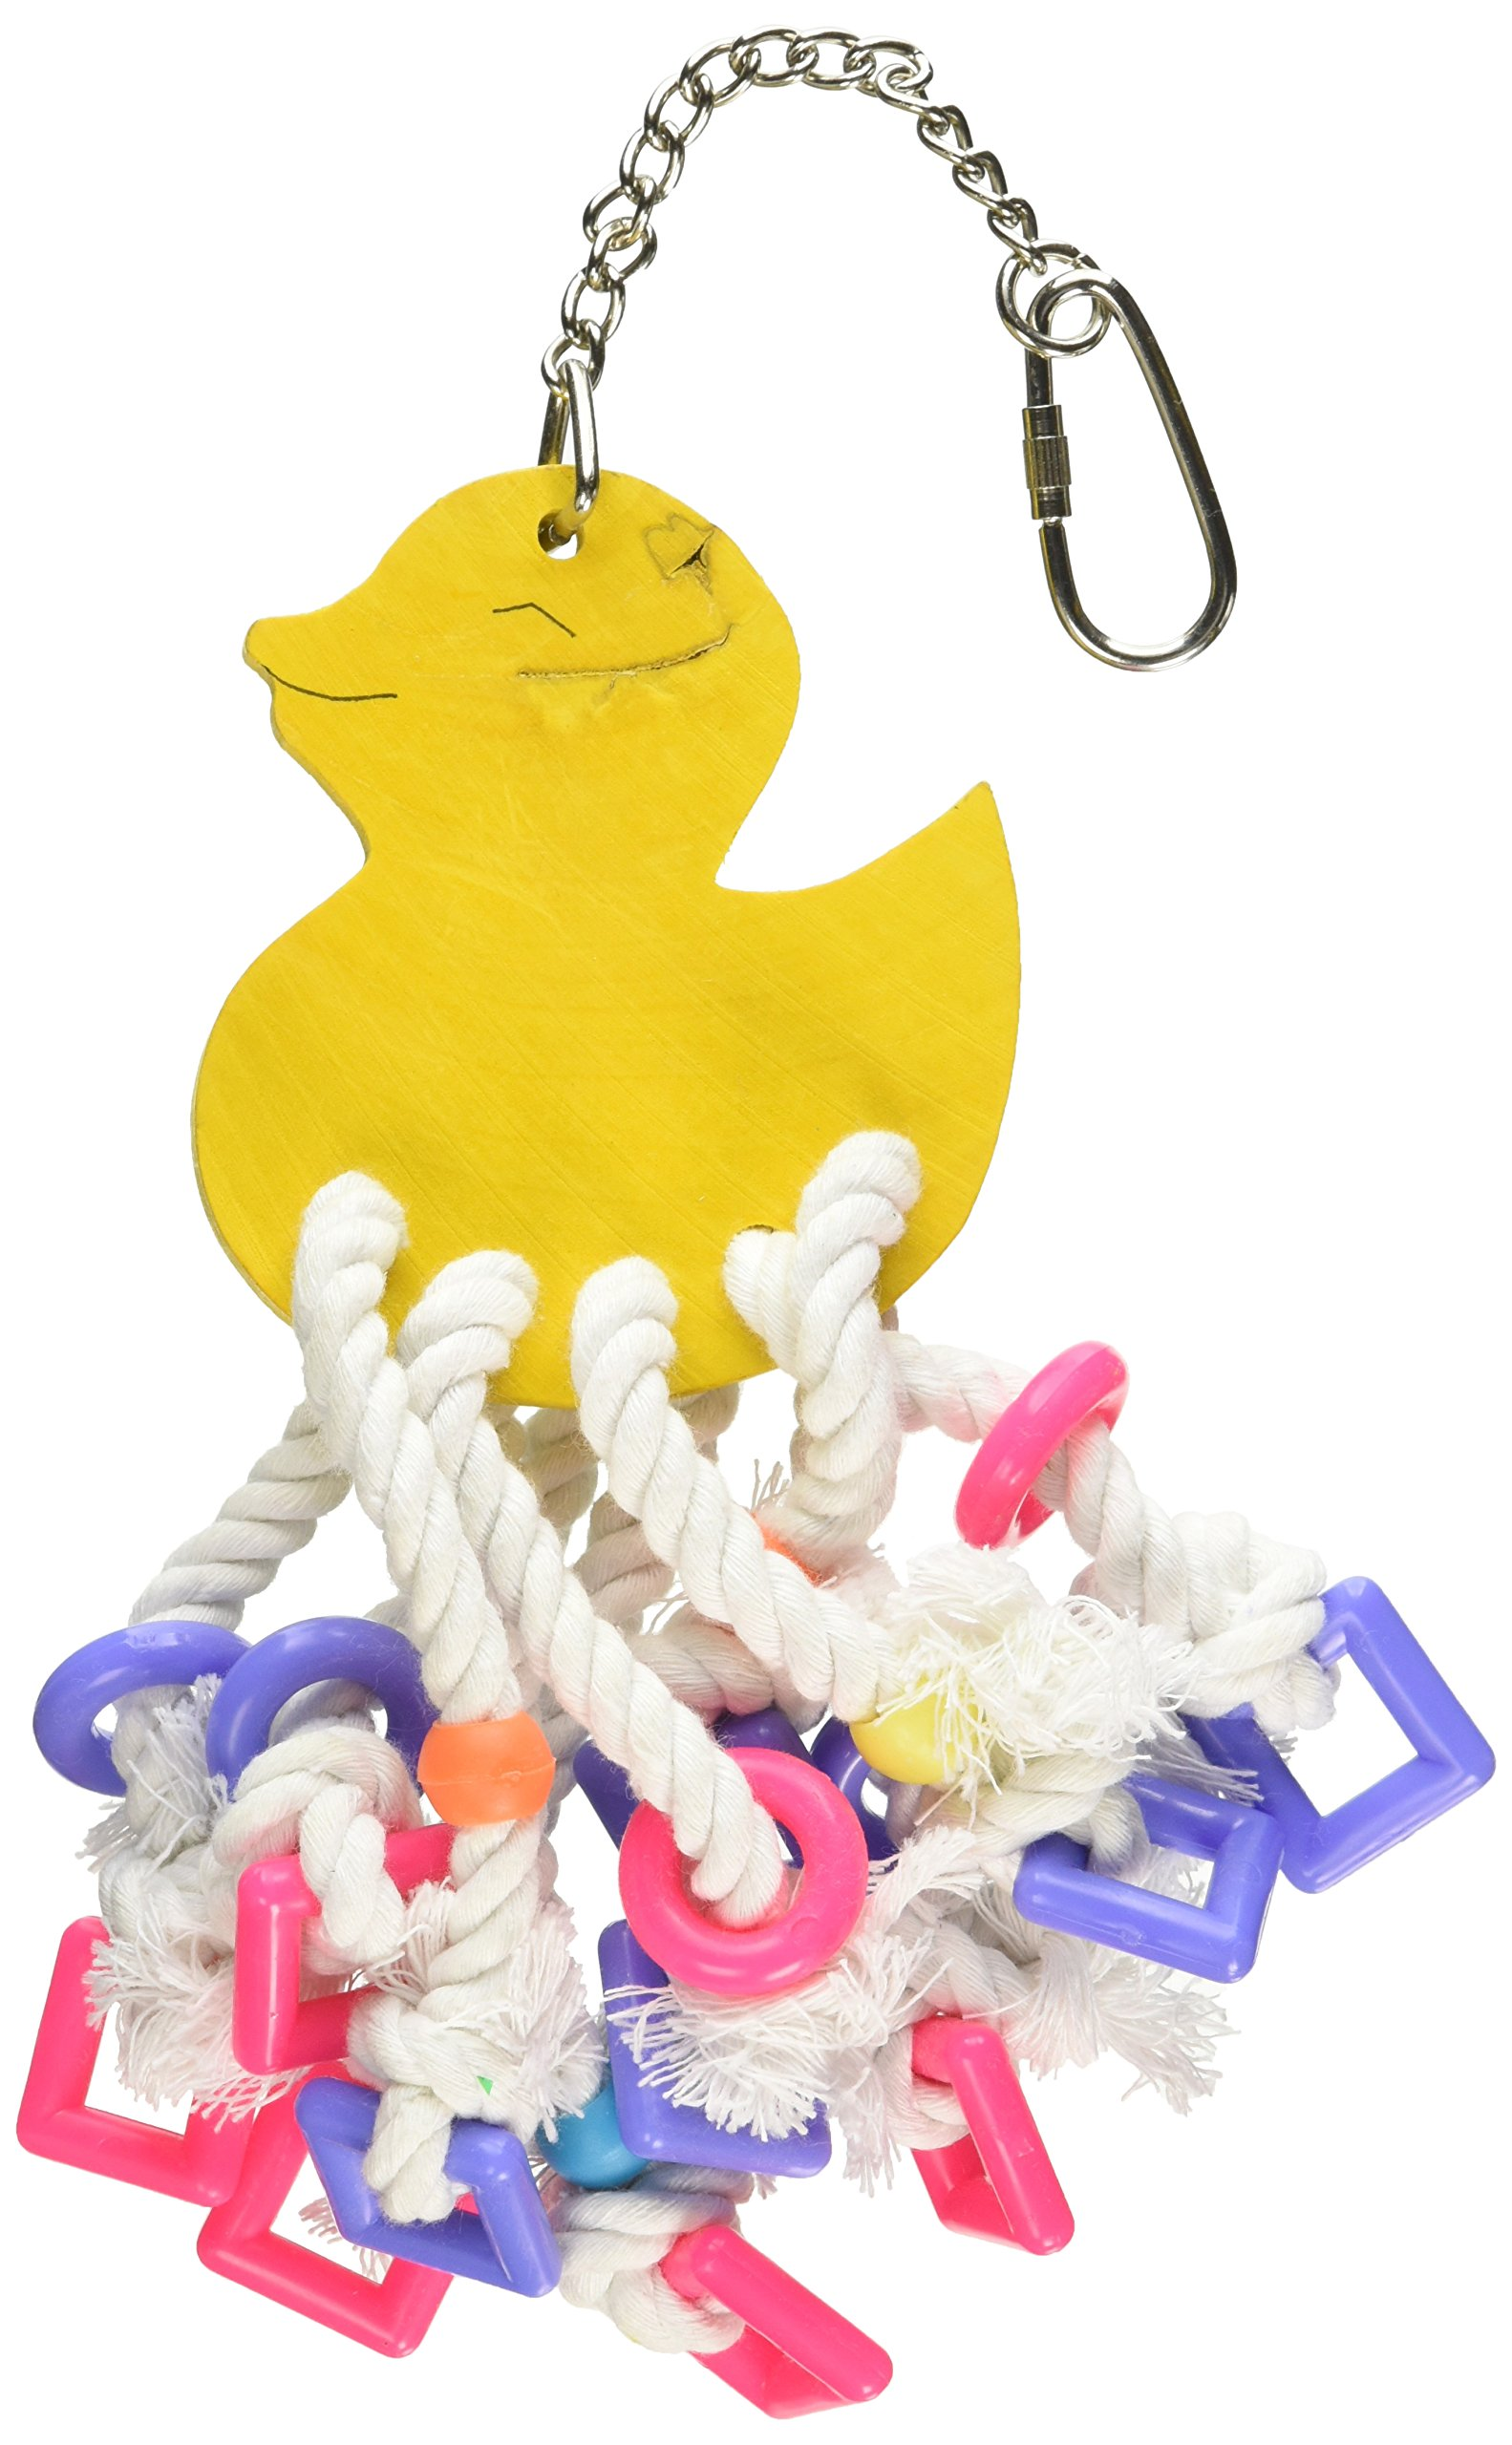 Jungle Talk Pet Products BJN98605 Lots of Legs Bird Activity Toys, Small/Medium